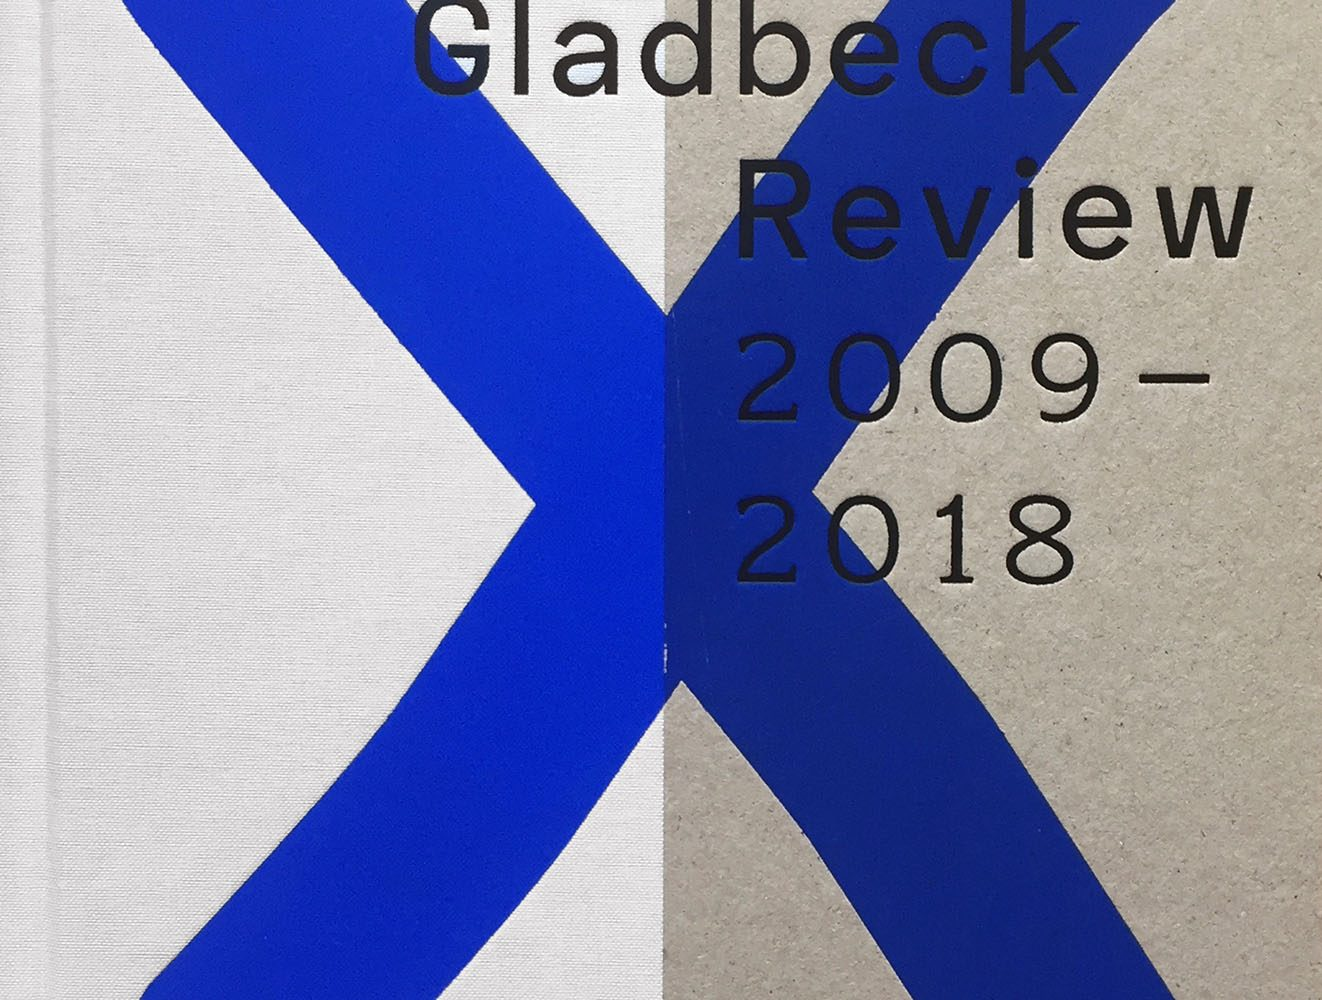 10Jahre3-Gladbeck-Angelika-J-Trojnarski